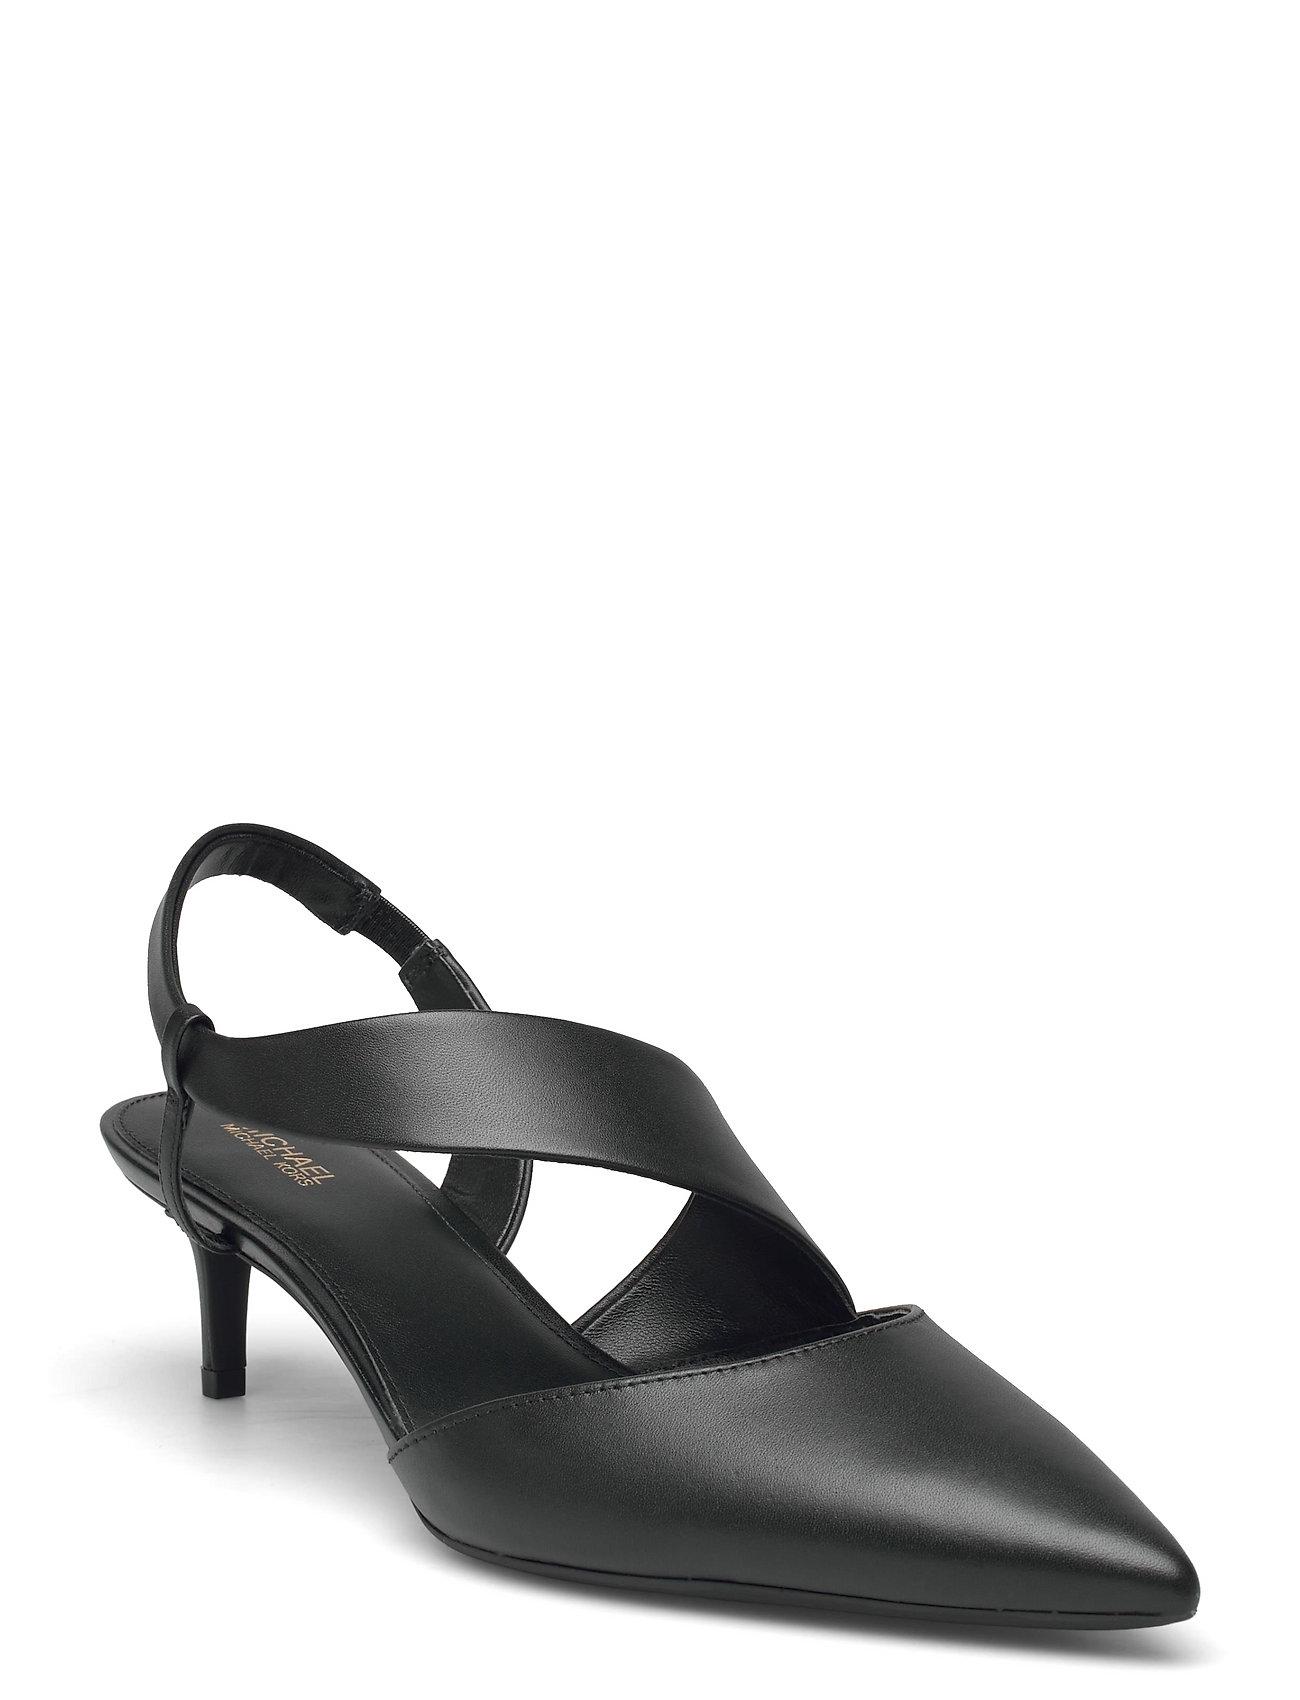 Juliet Flex Kitten Shoes Heels Pumps Sling Backs Sort Michael Kors